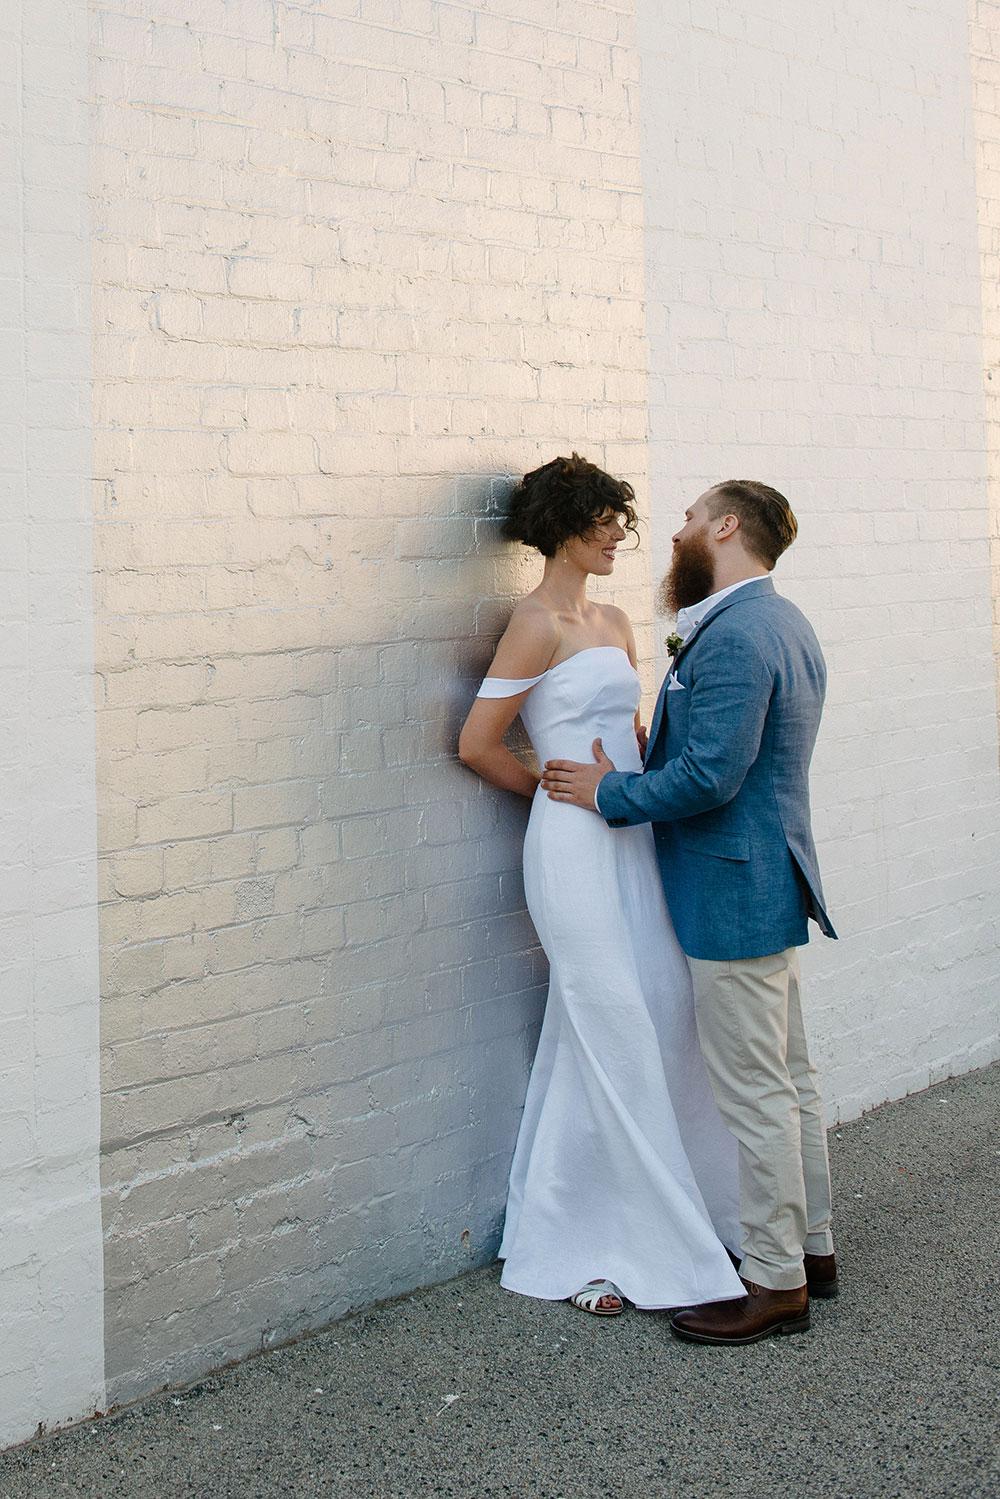 Maevana-wedding-dress-claire2.jpg